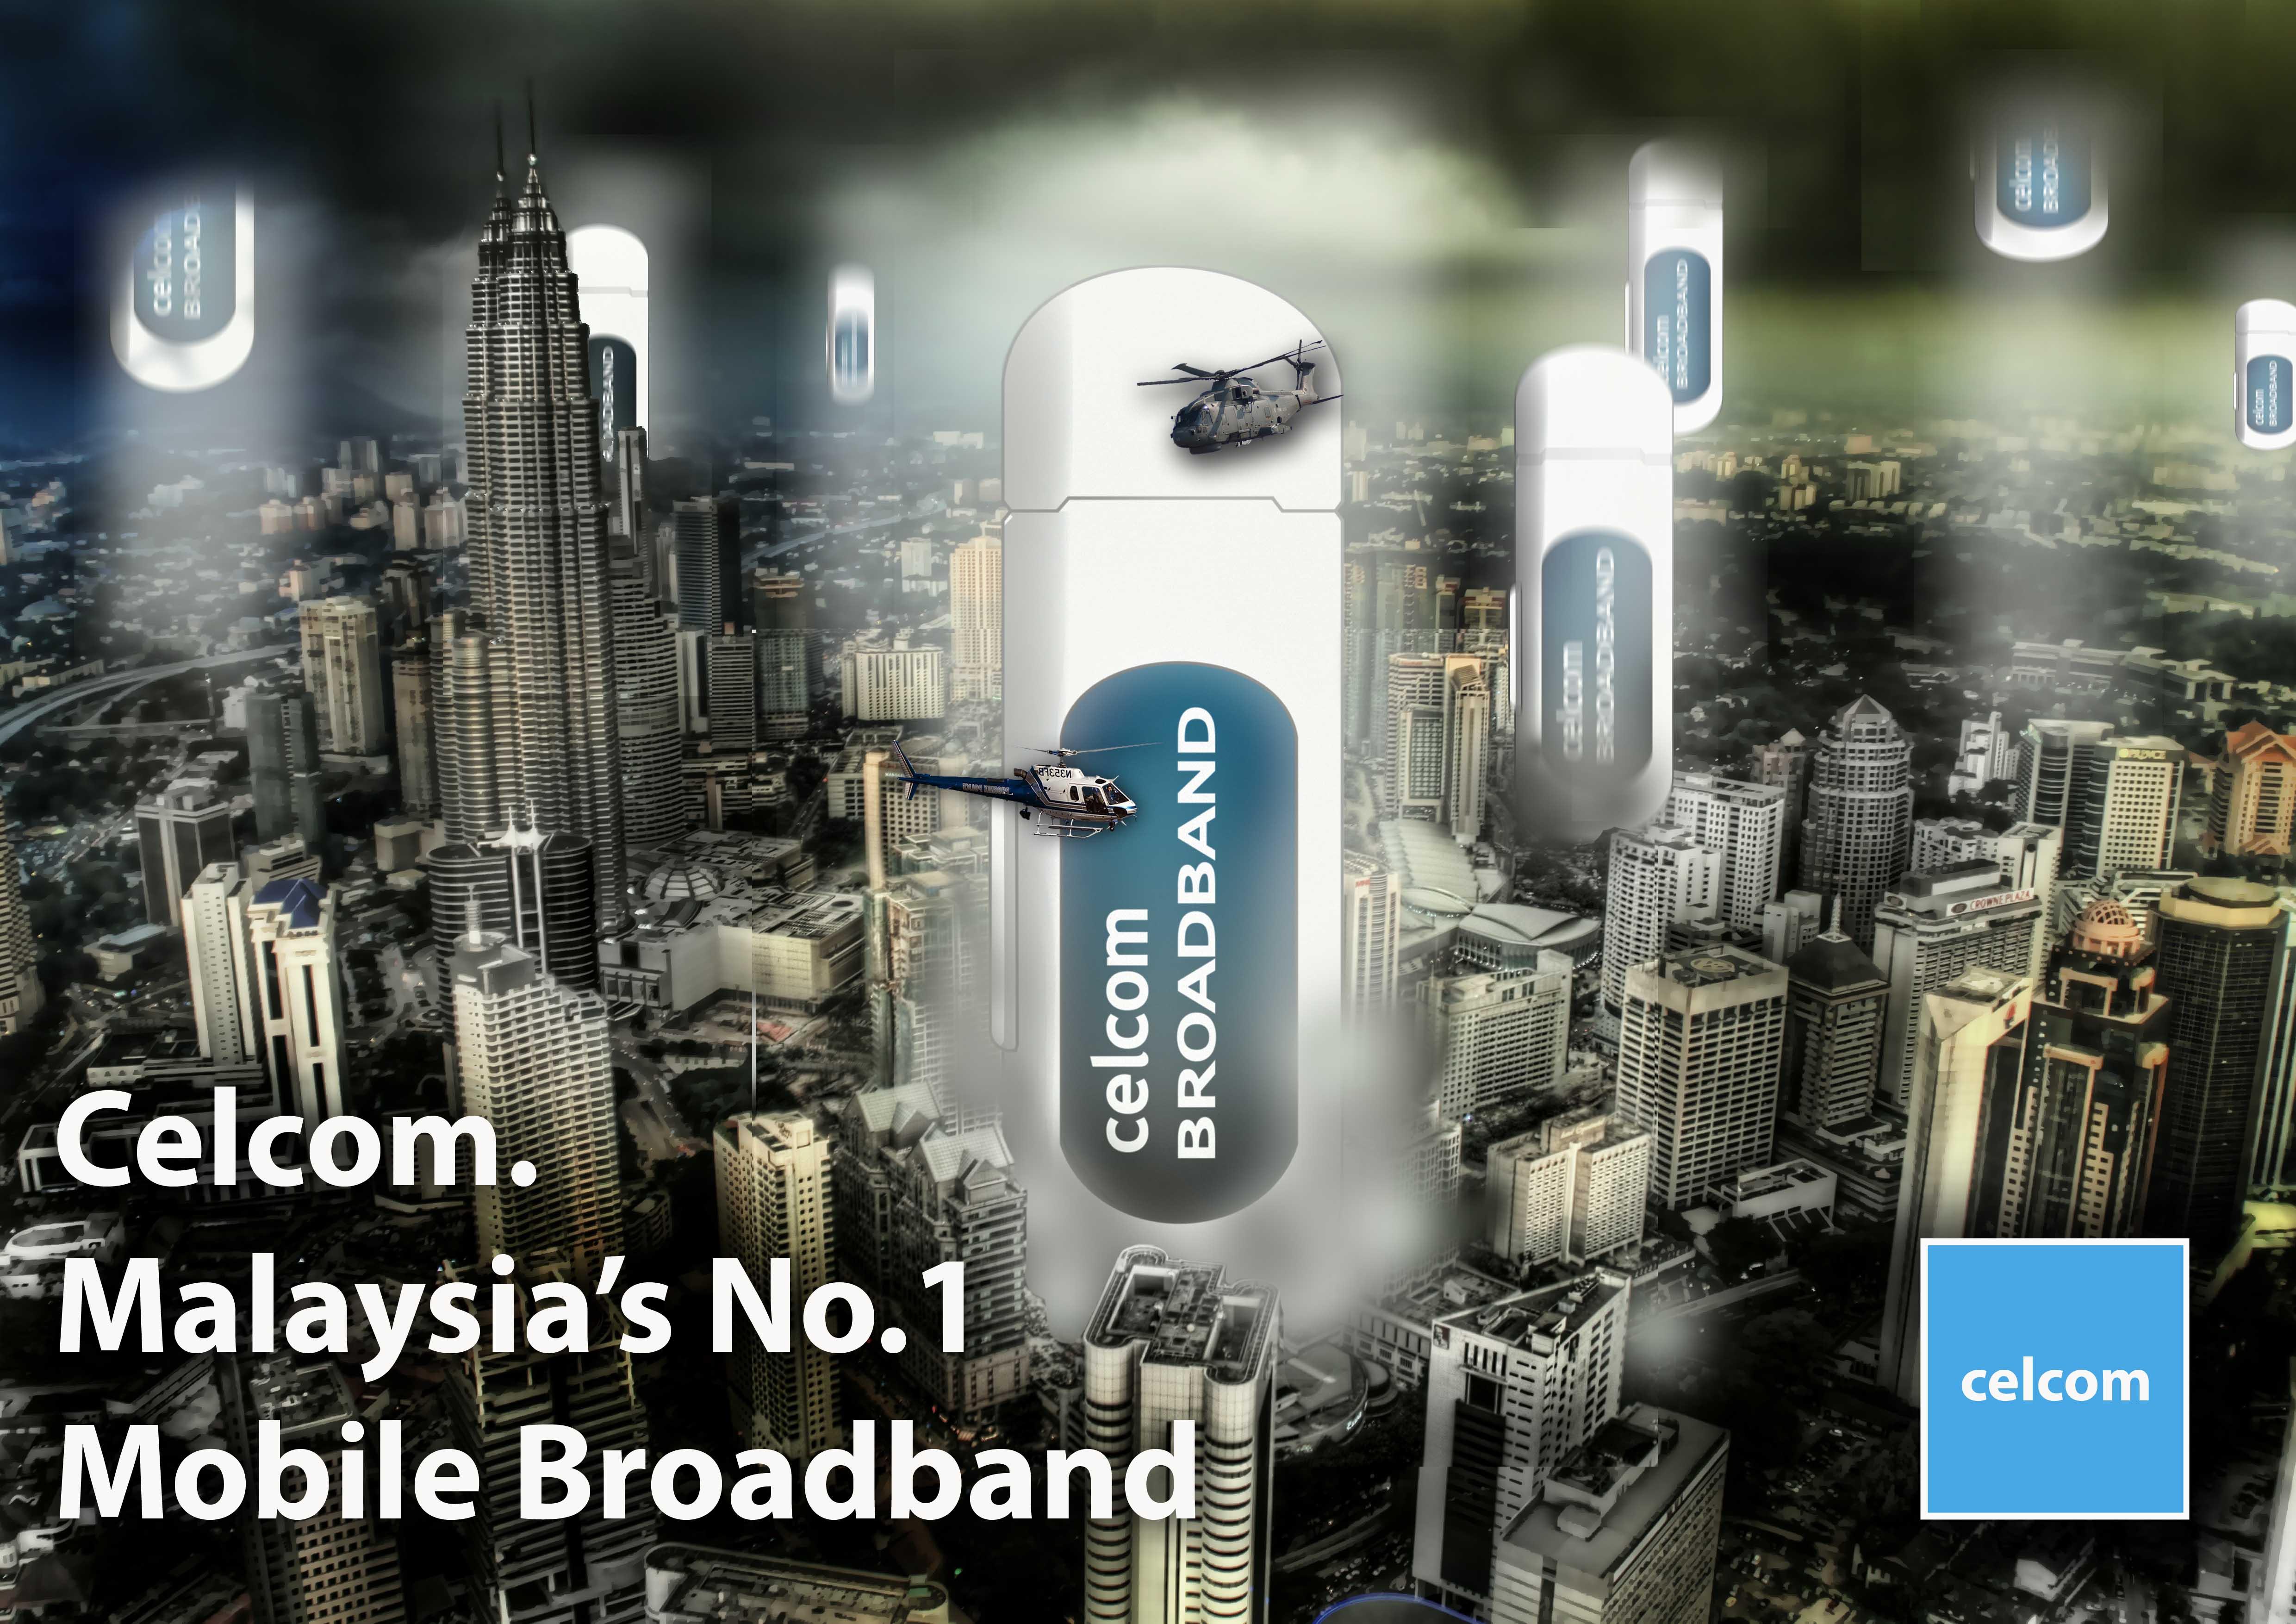 Broadband SKMM celcom sim prepaid (pengalaman pengguna)